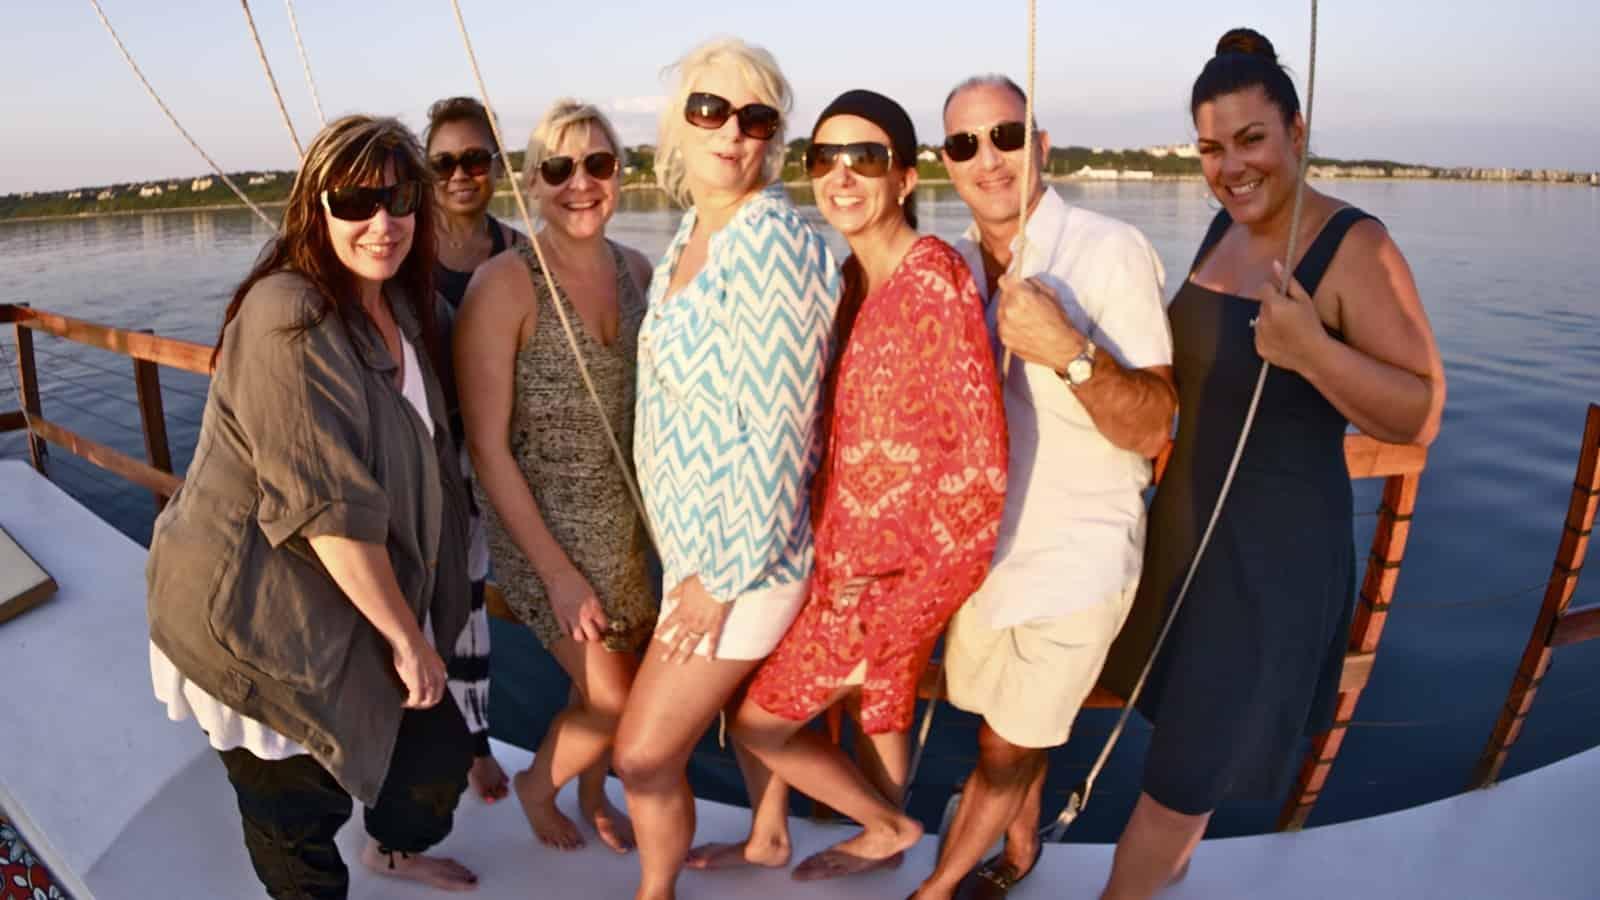 Group portrait of the Sephora team at the rail of the catamaran Mon Tiki, photo by Sailing Montauk